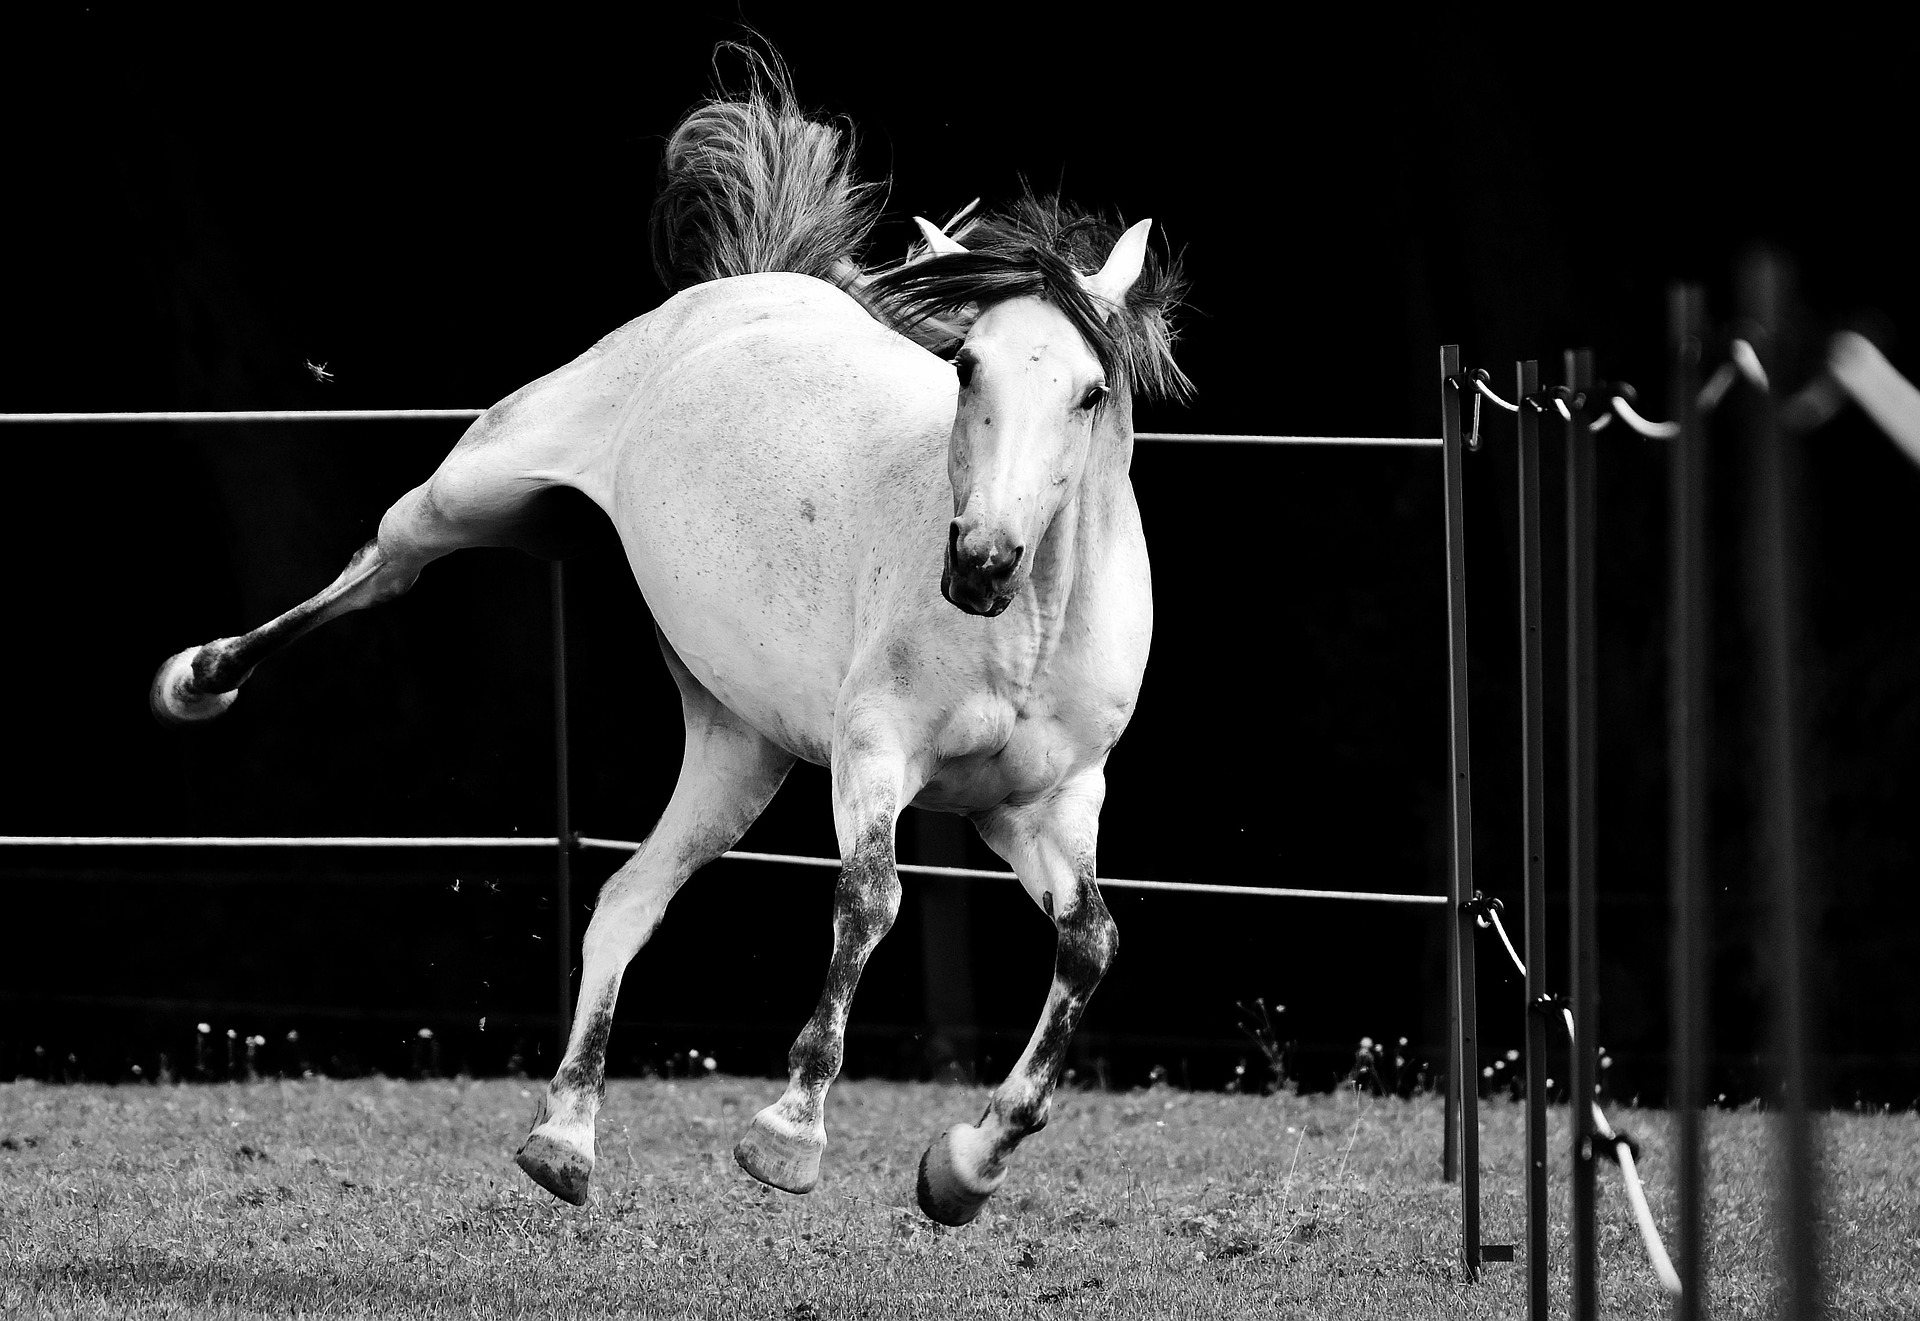 glucosamine sulphate, glucosamine for horses, joint supplement for horses